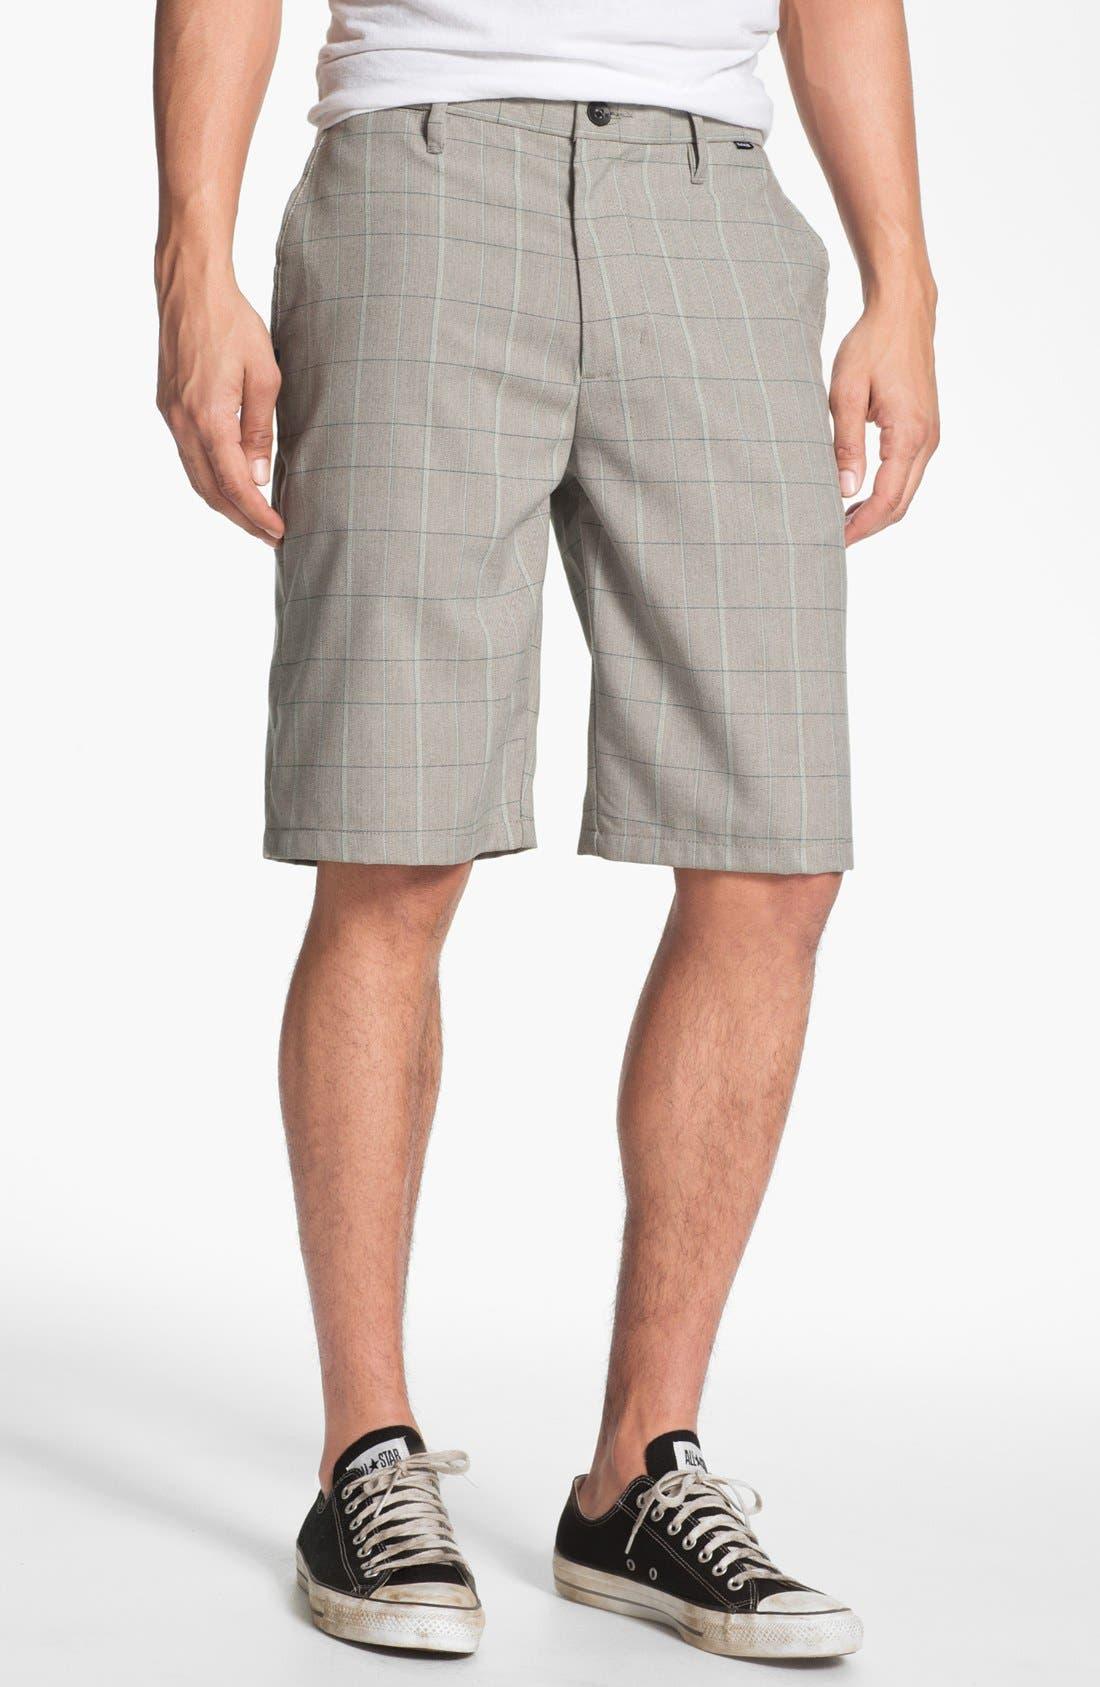 Main Image - Hurley 'Puerta Nueva' Shorts